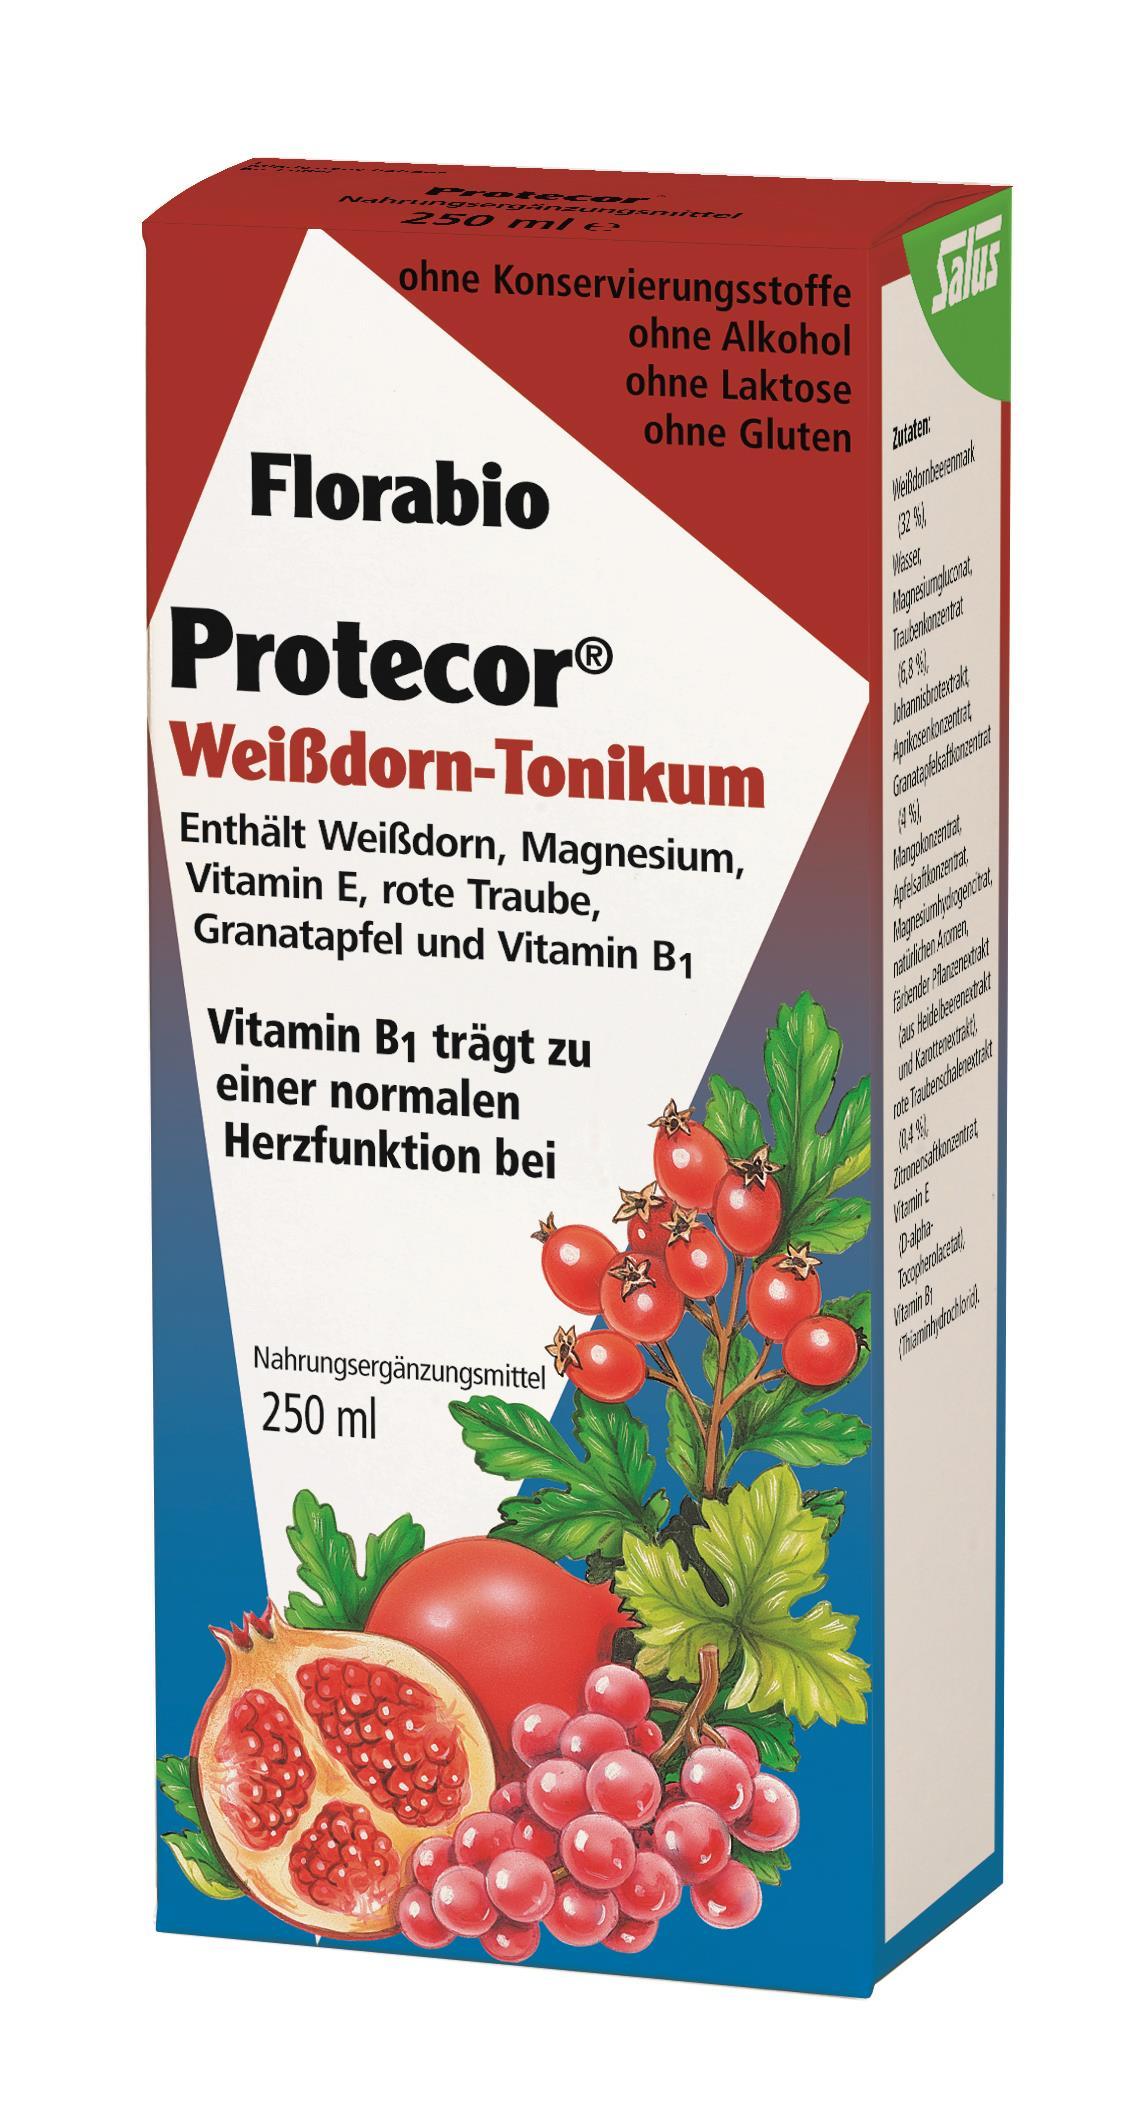 Florabio Protecor Weißdorn-Tonikum